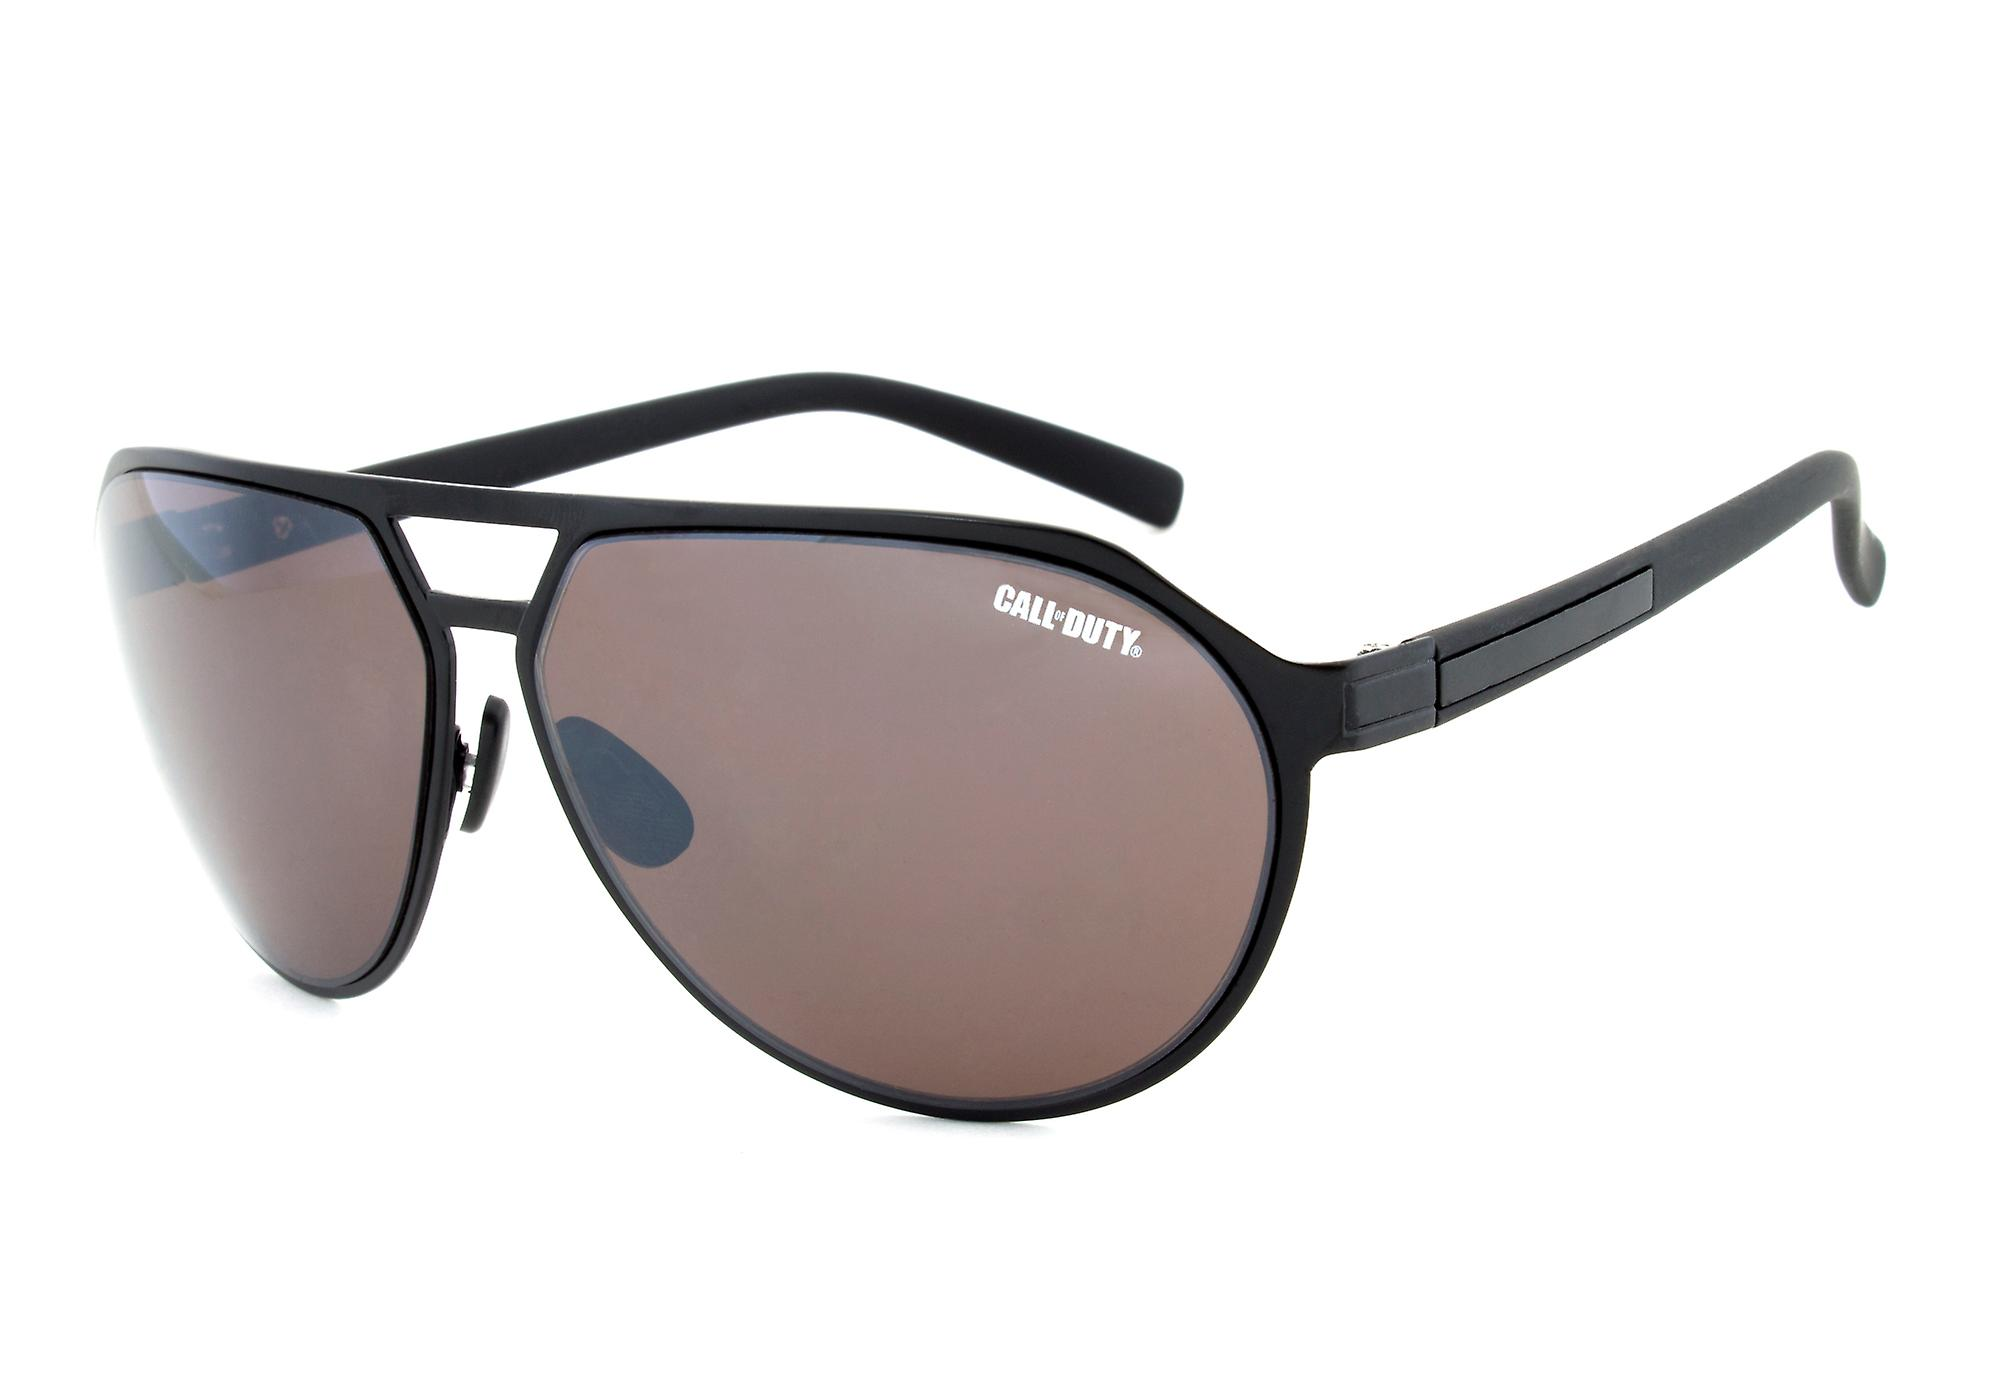 Call of Duty Black Aviator Sunglasses with Copper Contrast Sun Lens